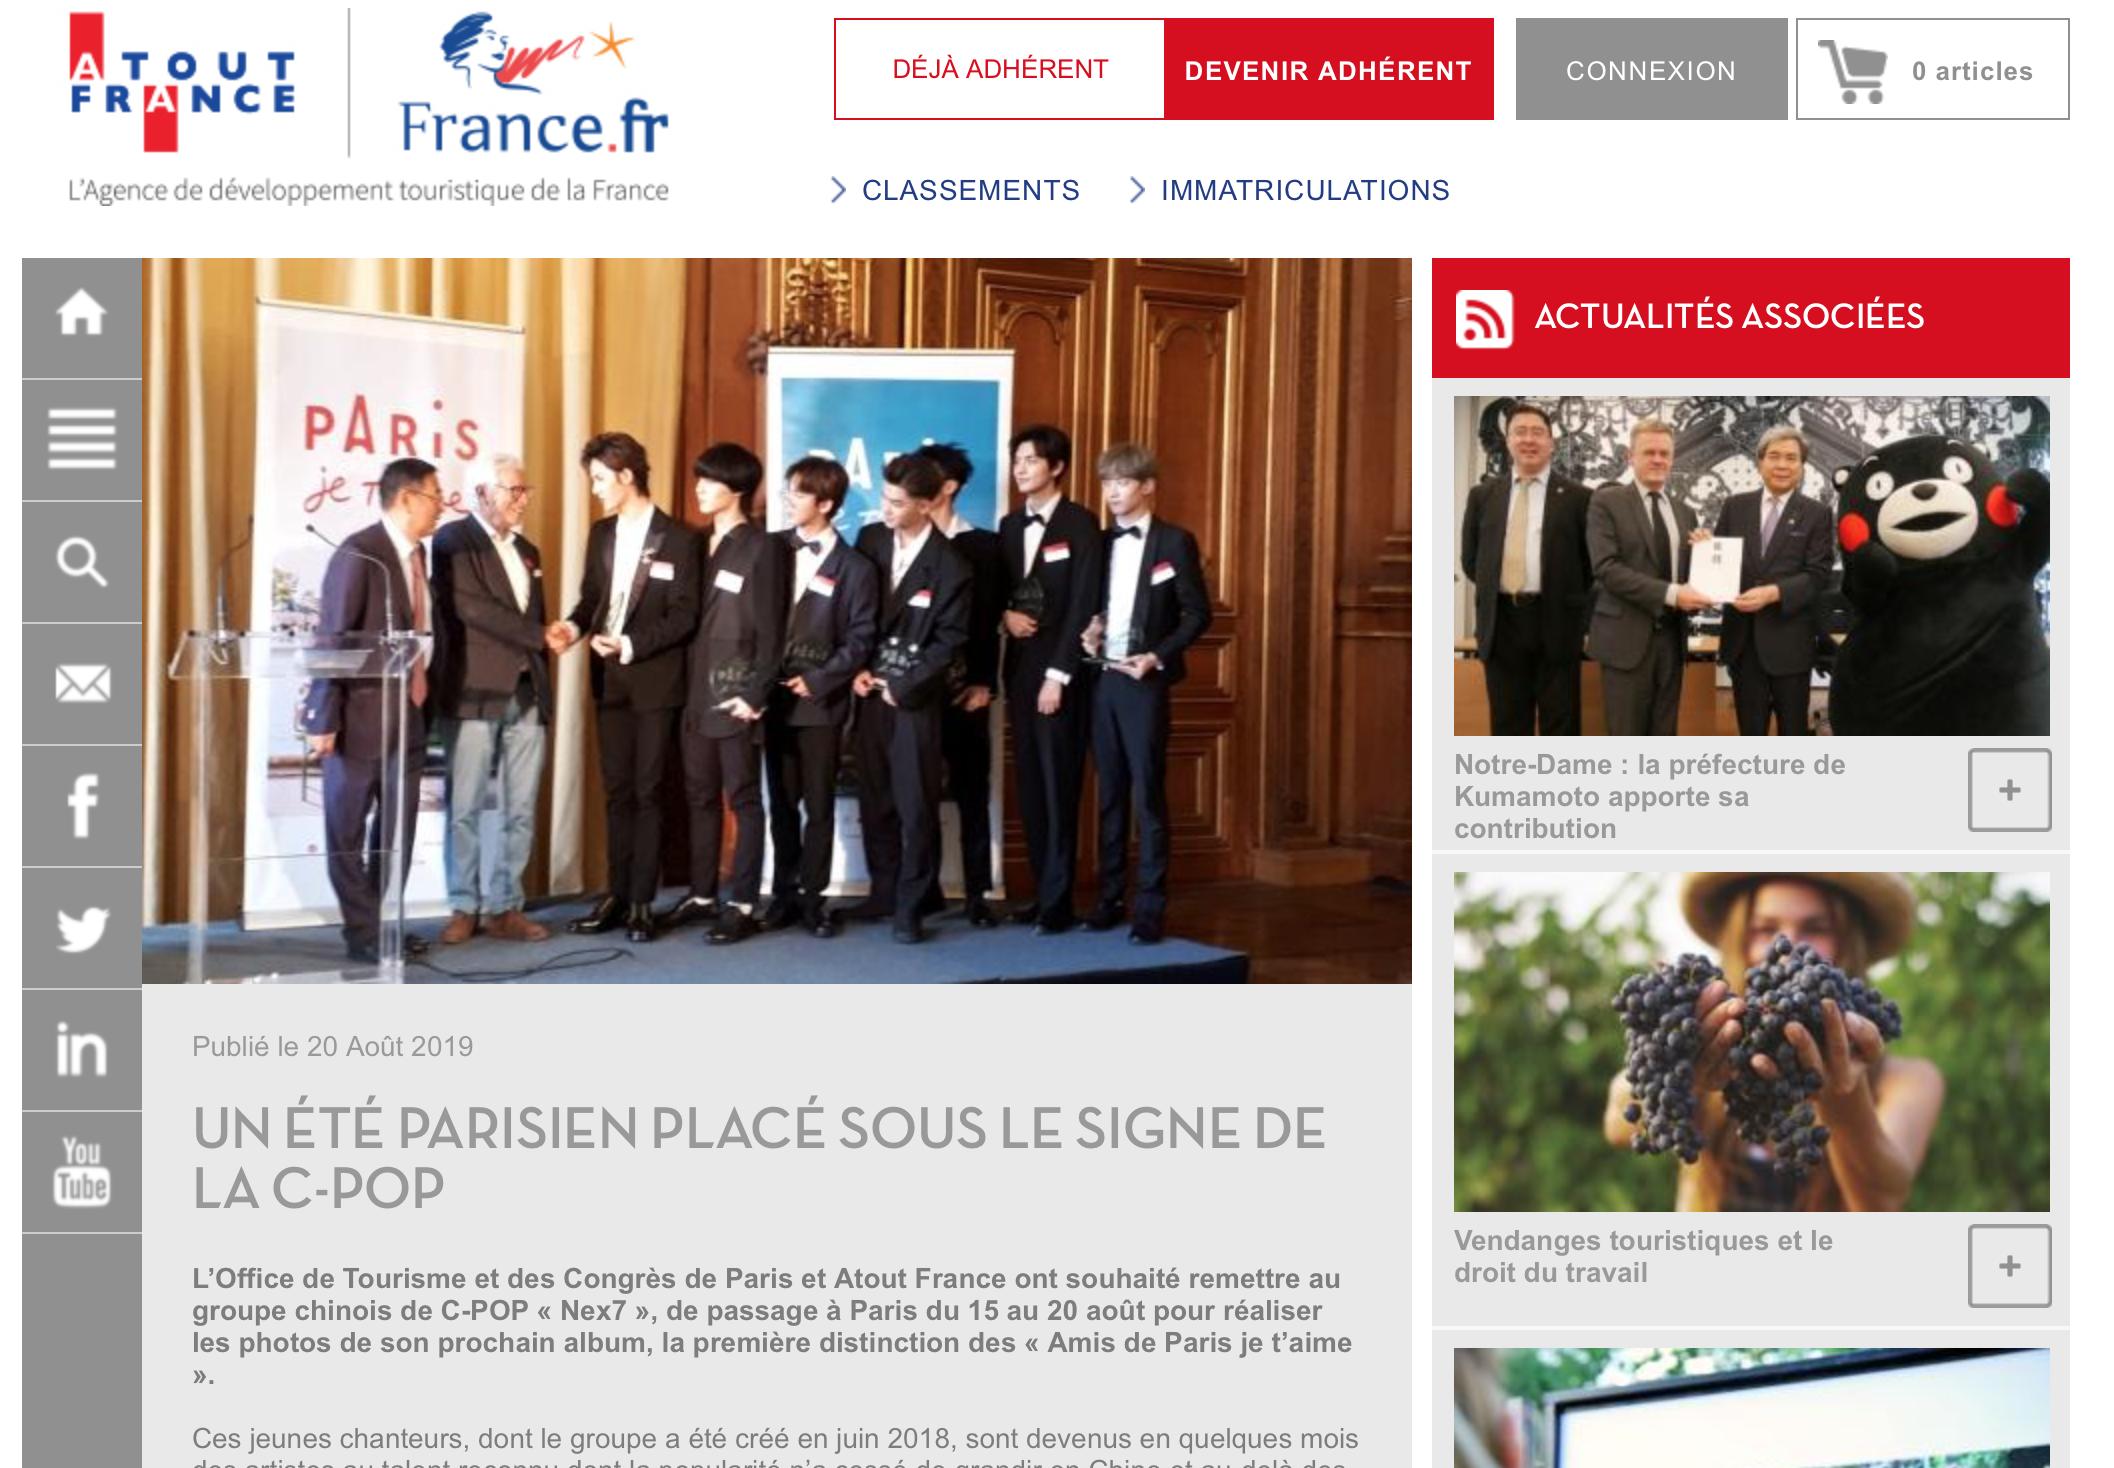 Marketing Campaigns, KOL Campaign of Paris je t'aime